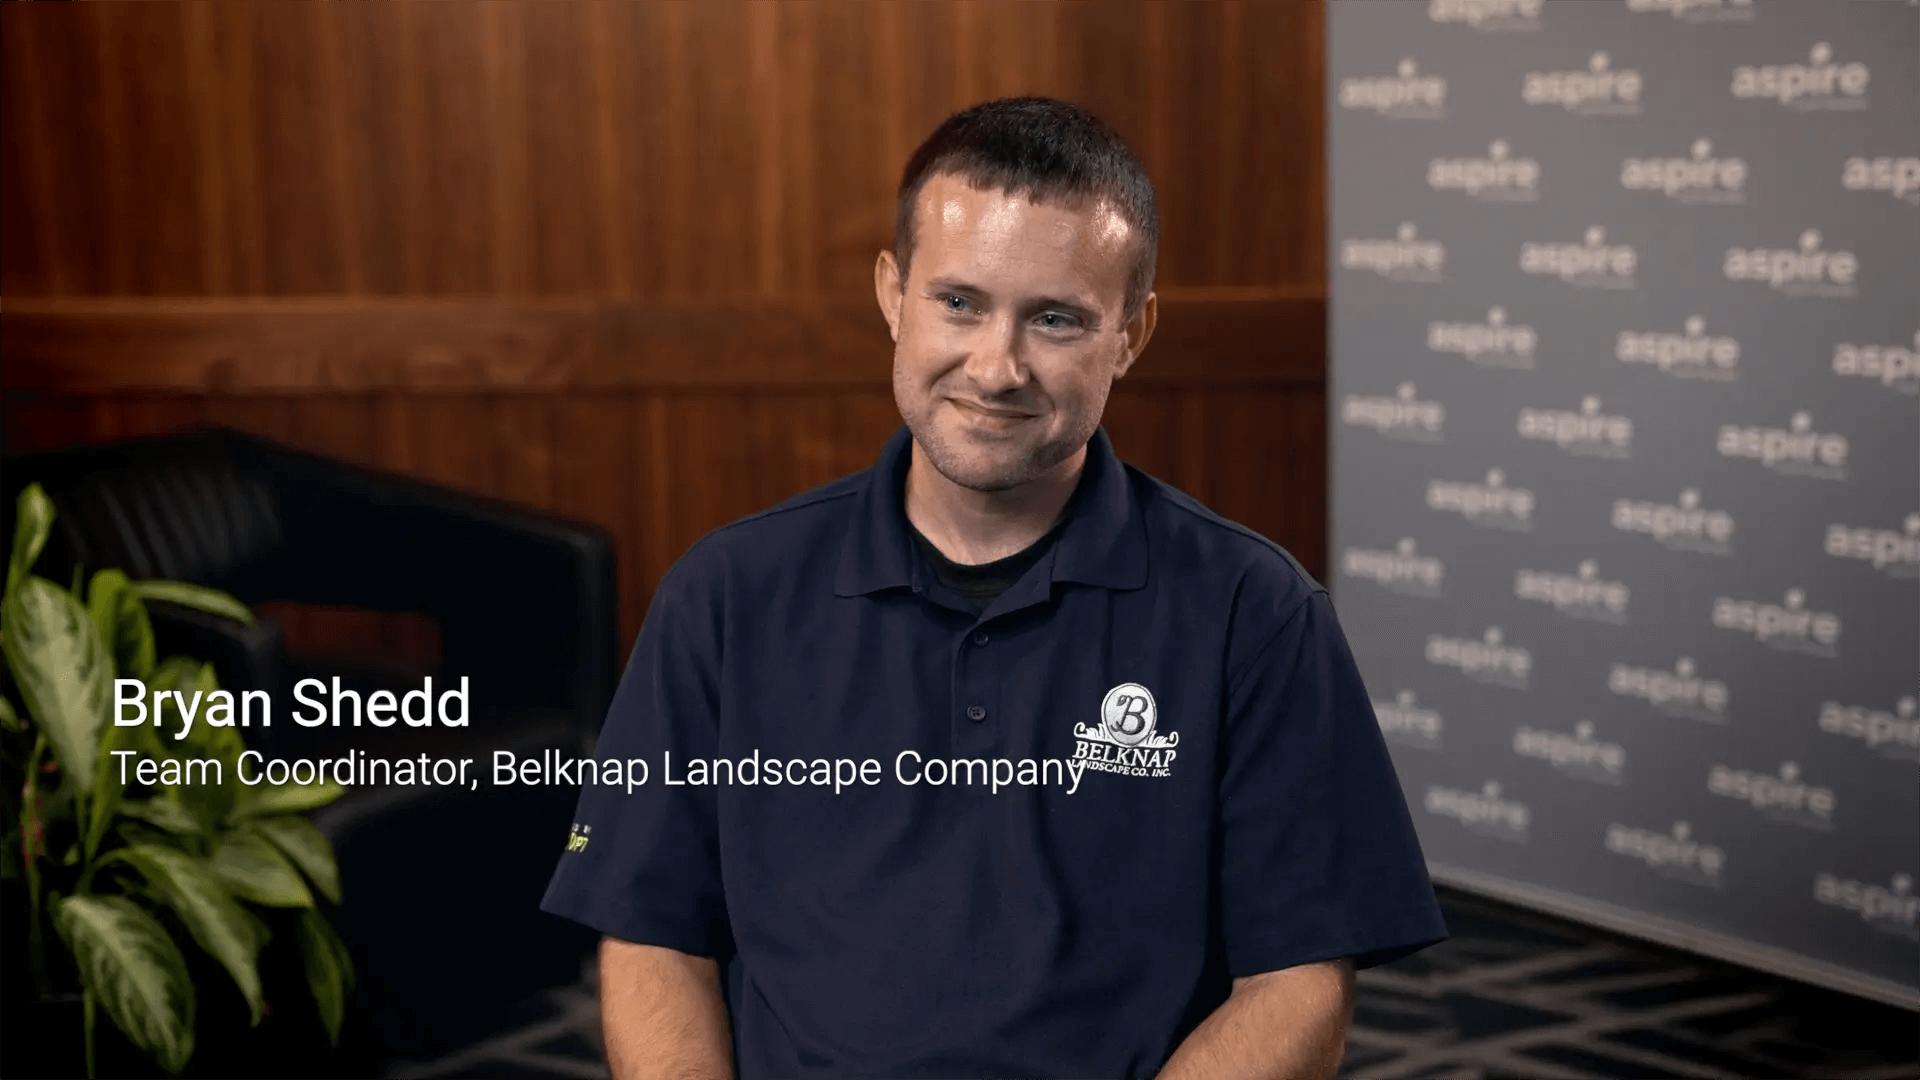 Aspire + Belknap Landscape: Customer testimonial